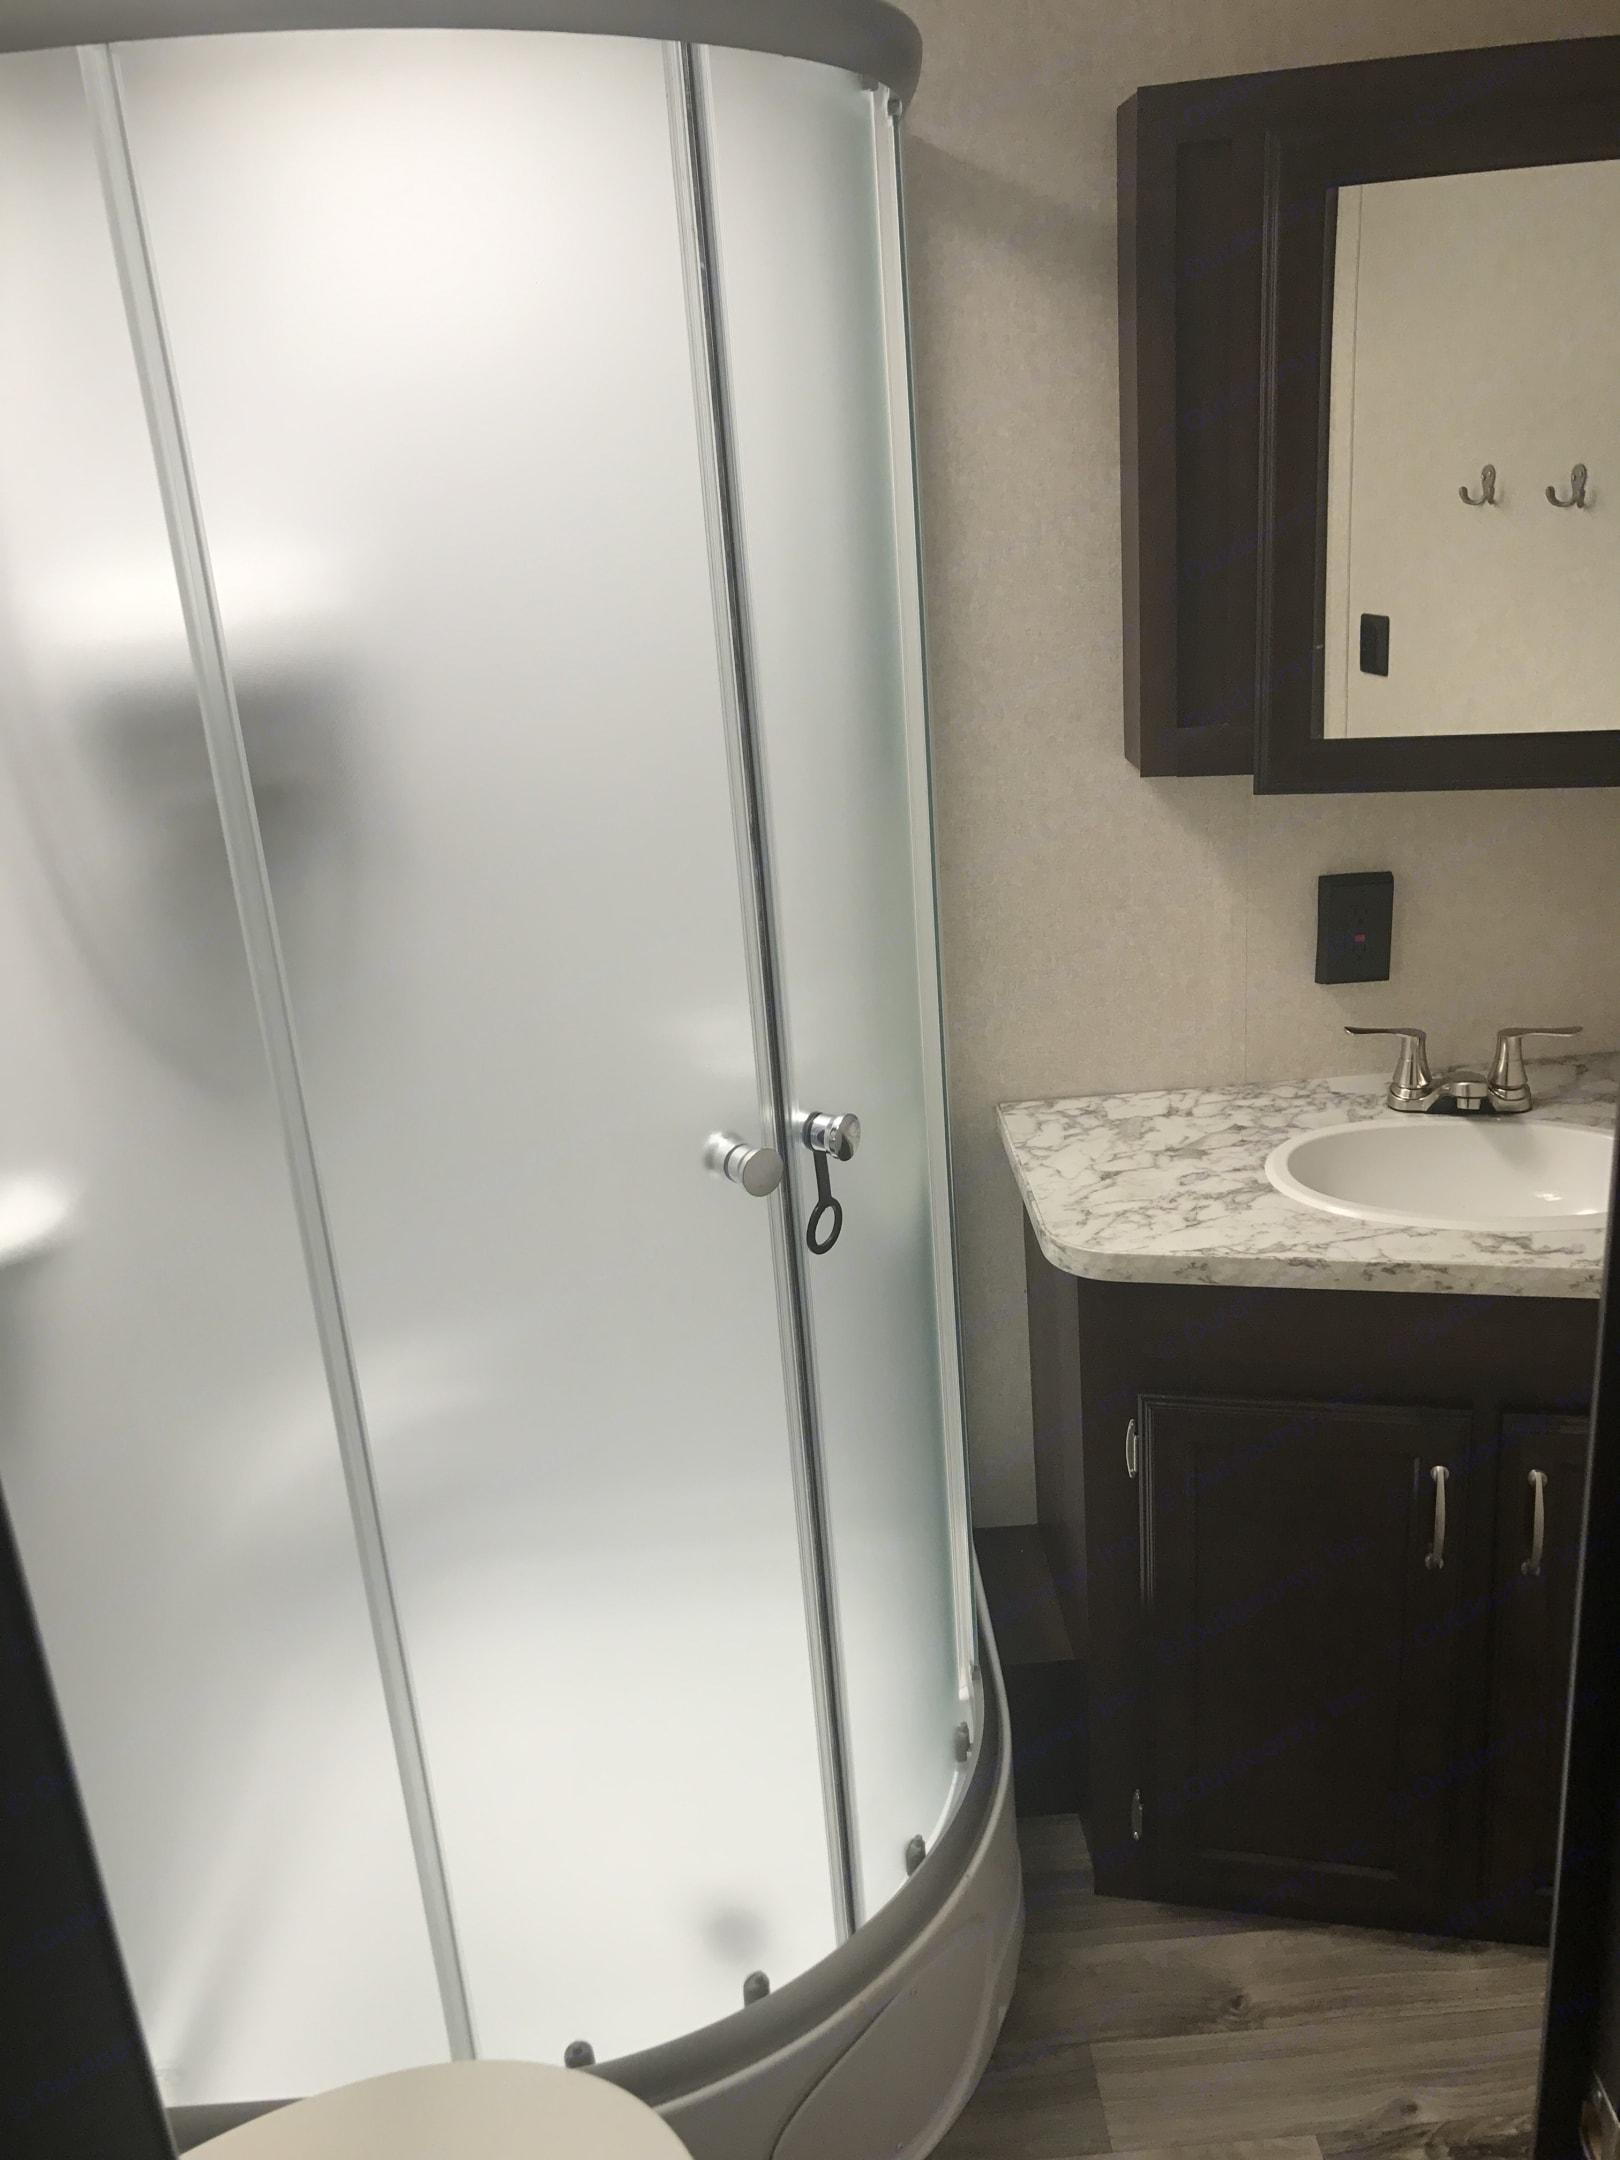 Bathroom with standup shower. Jayco Jay Flight 2018